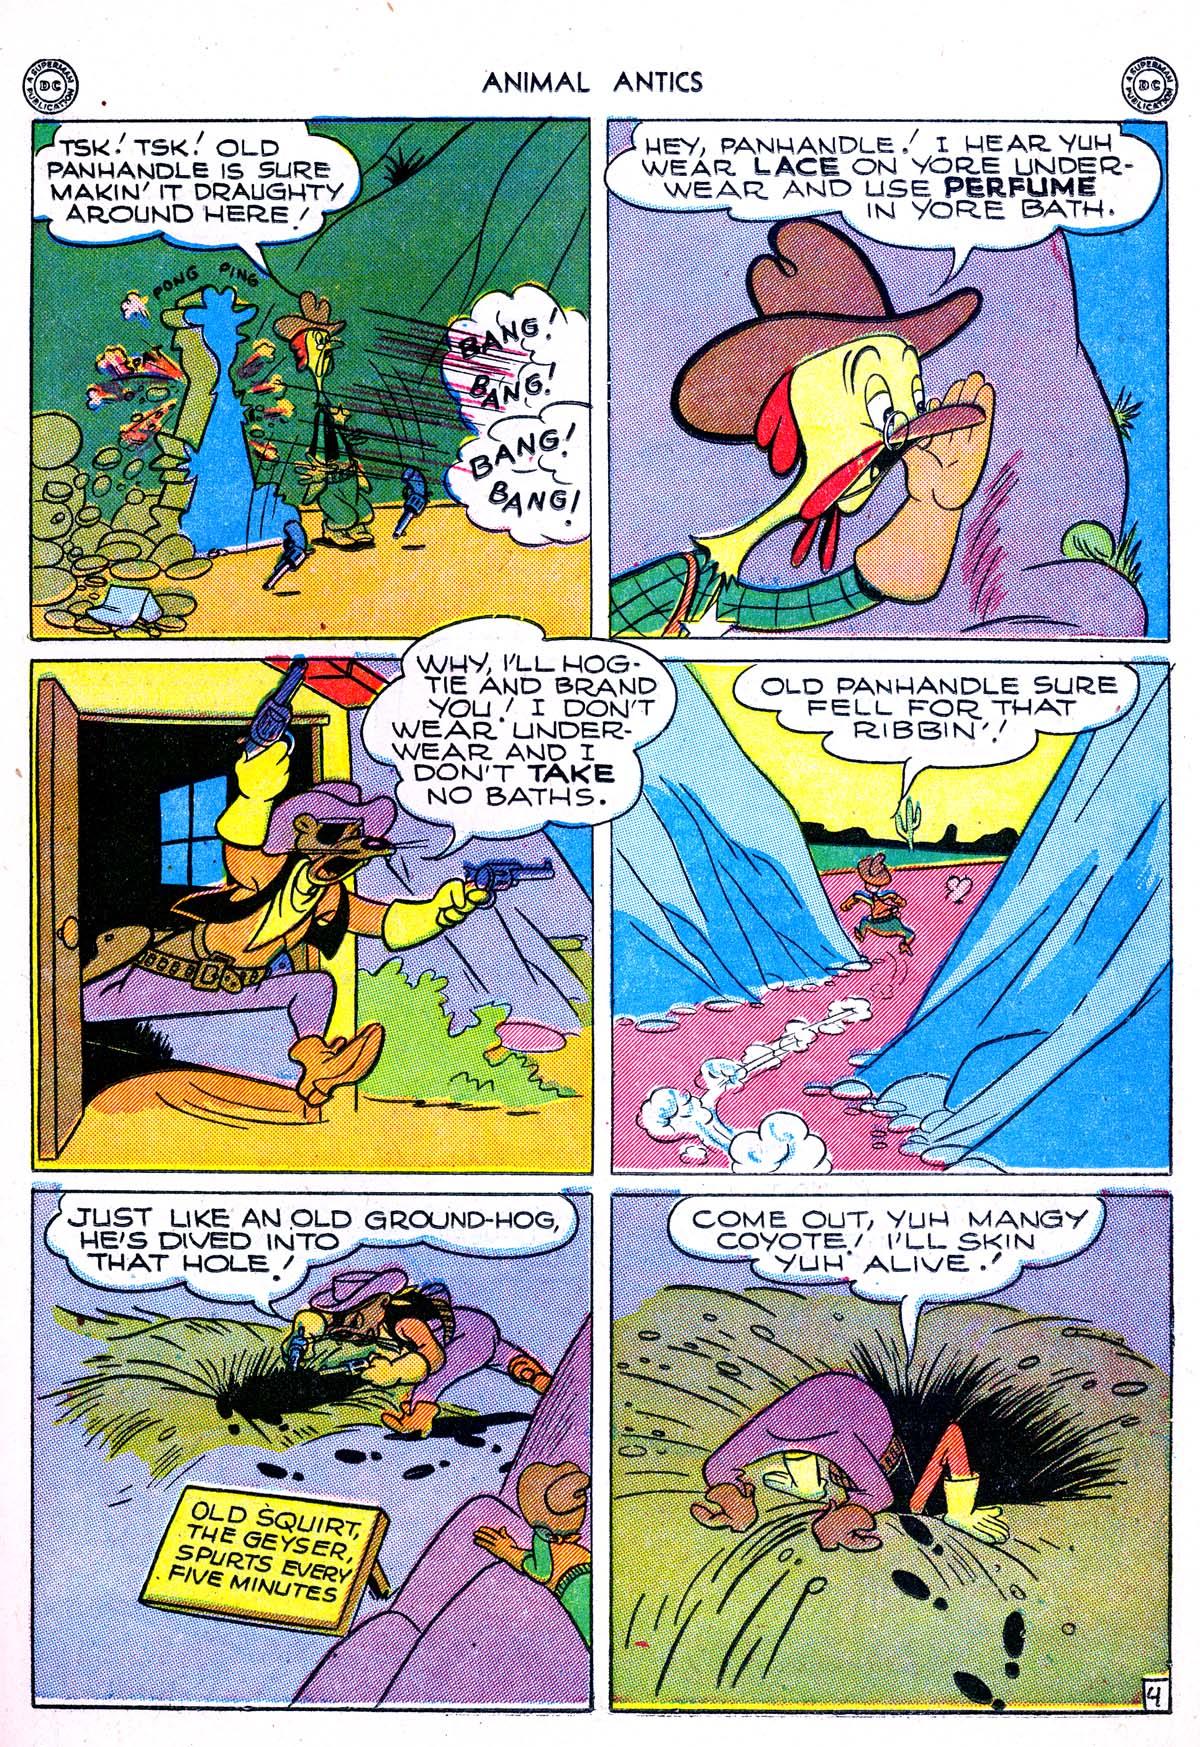 Read online Animal Antics comic -  Issue #1 - 15